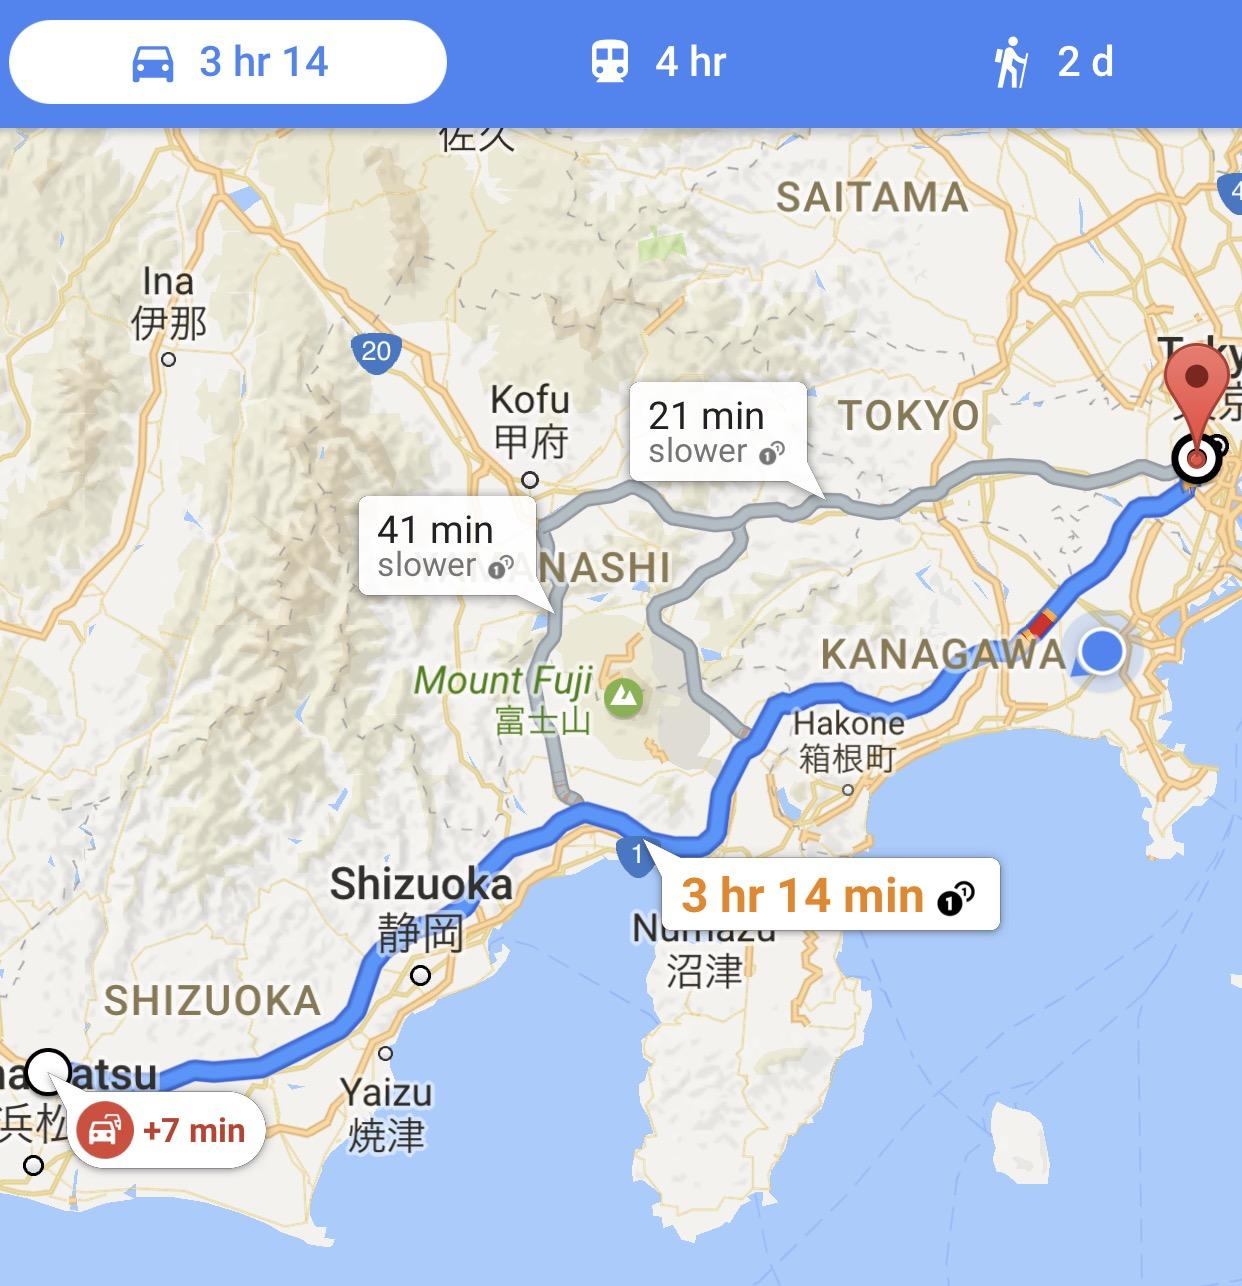 Day Two's goal: Hamamatsu SA to Tokyo, with a stop at the Yokohama service center in Totsuka